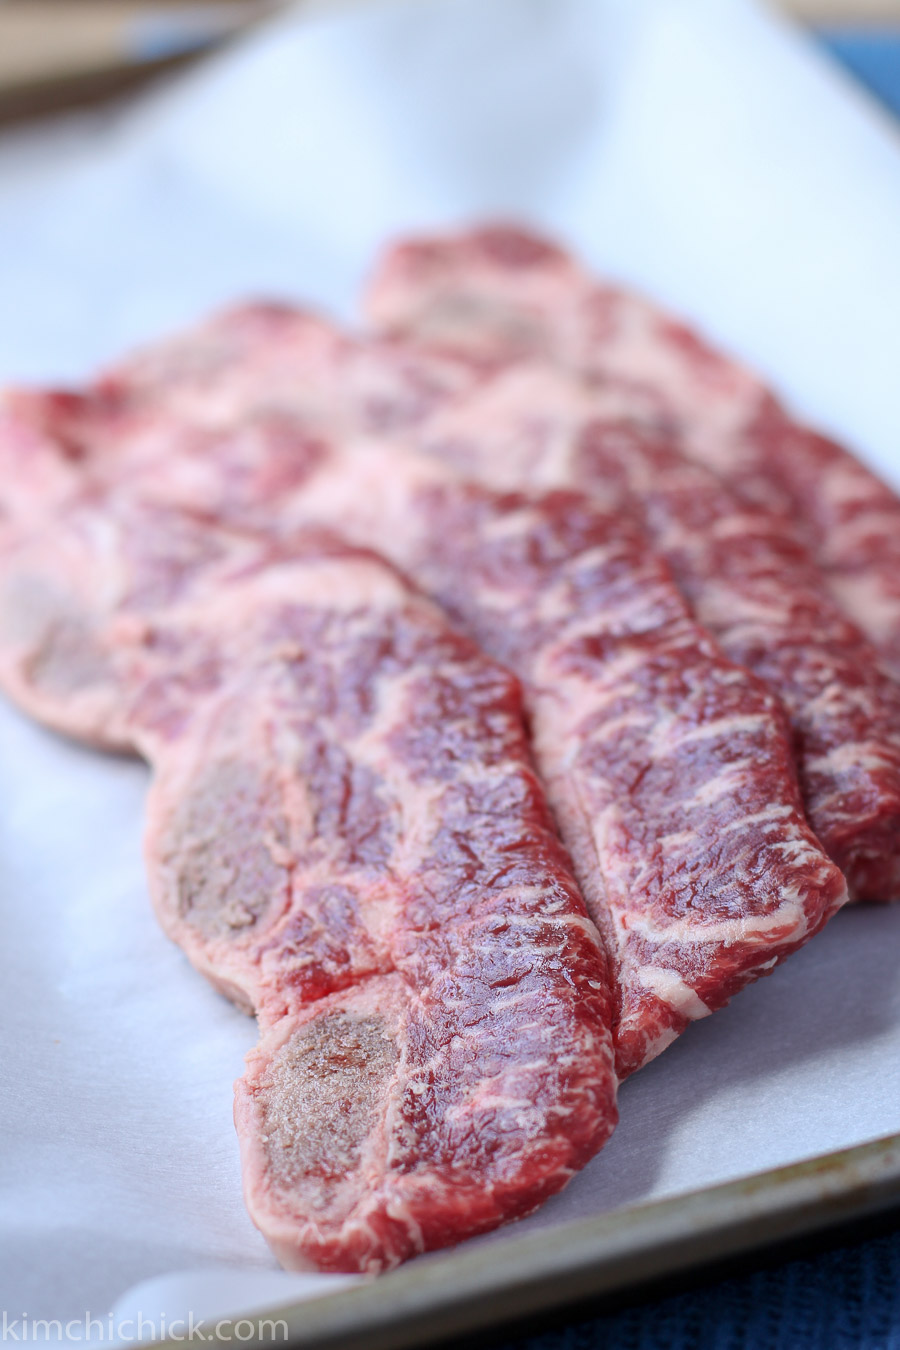 Galbi: Korean BBQ beef short ribs